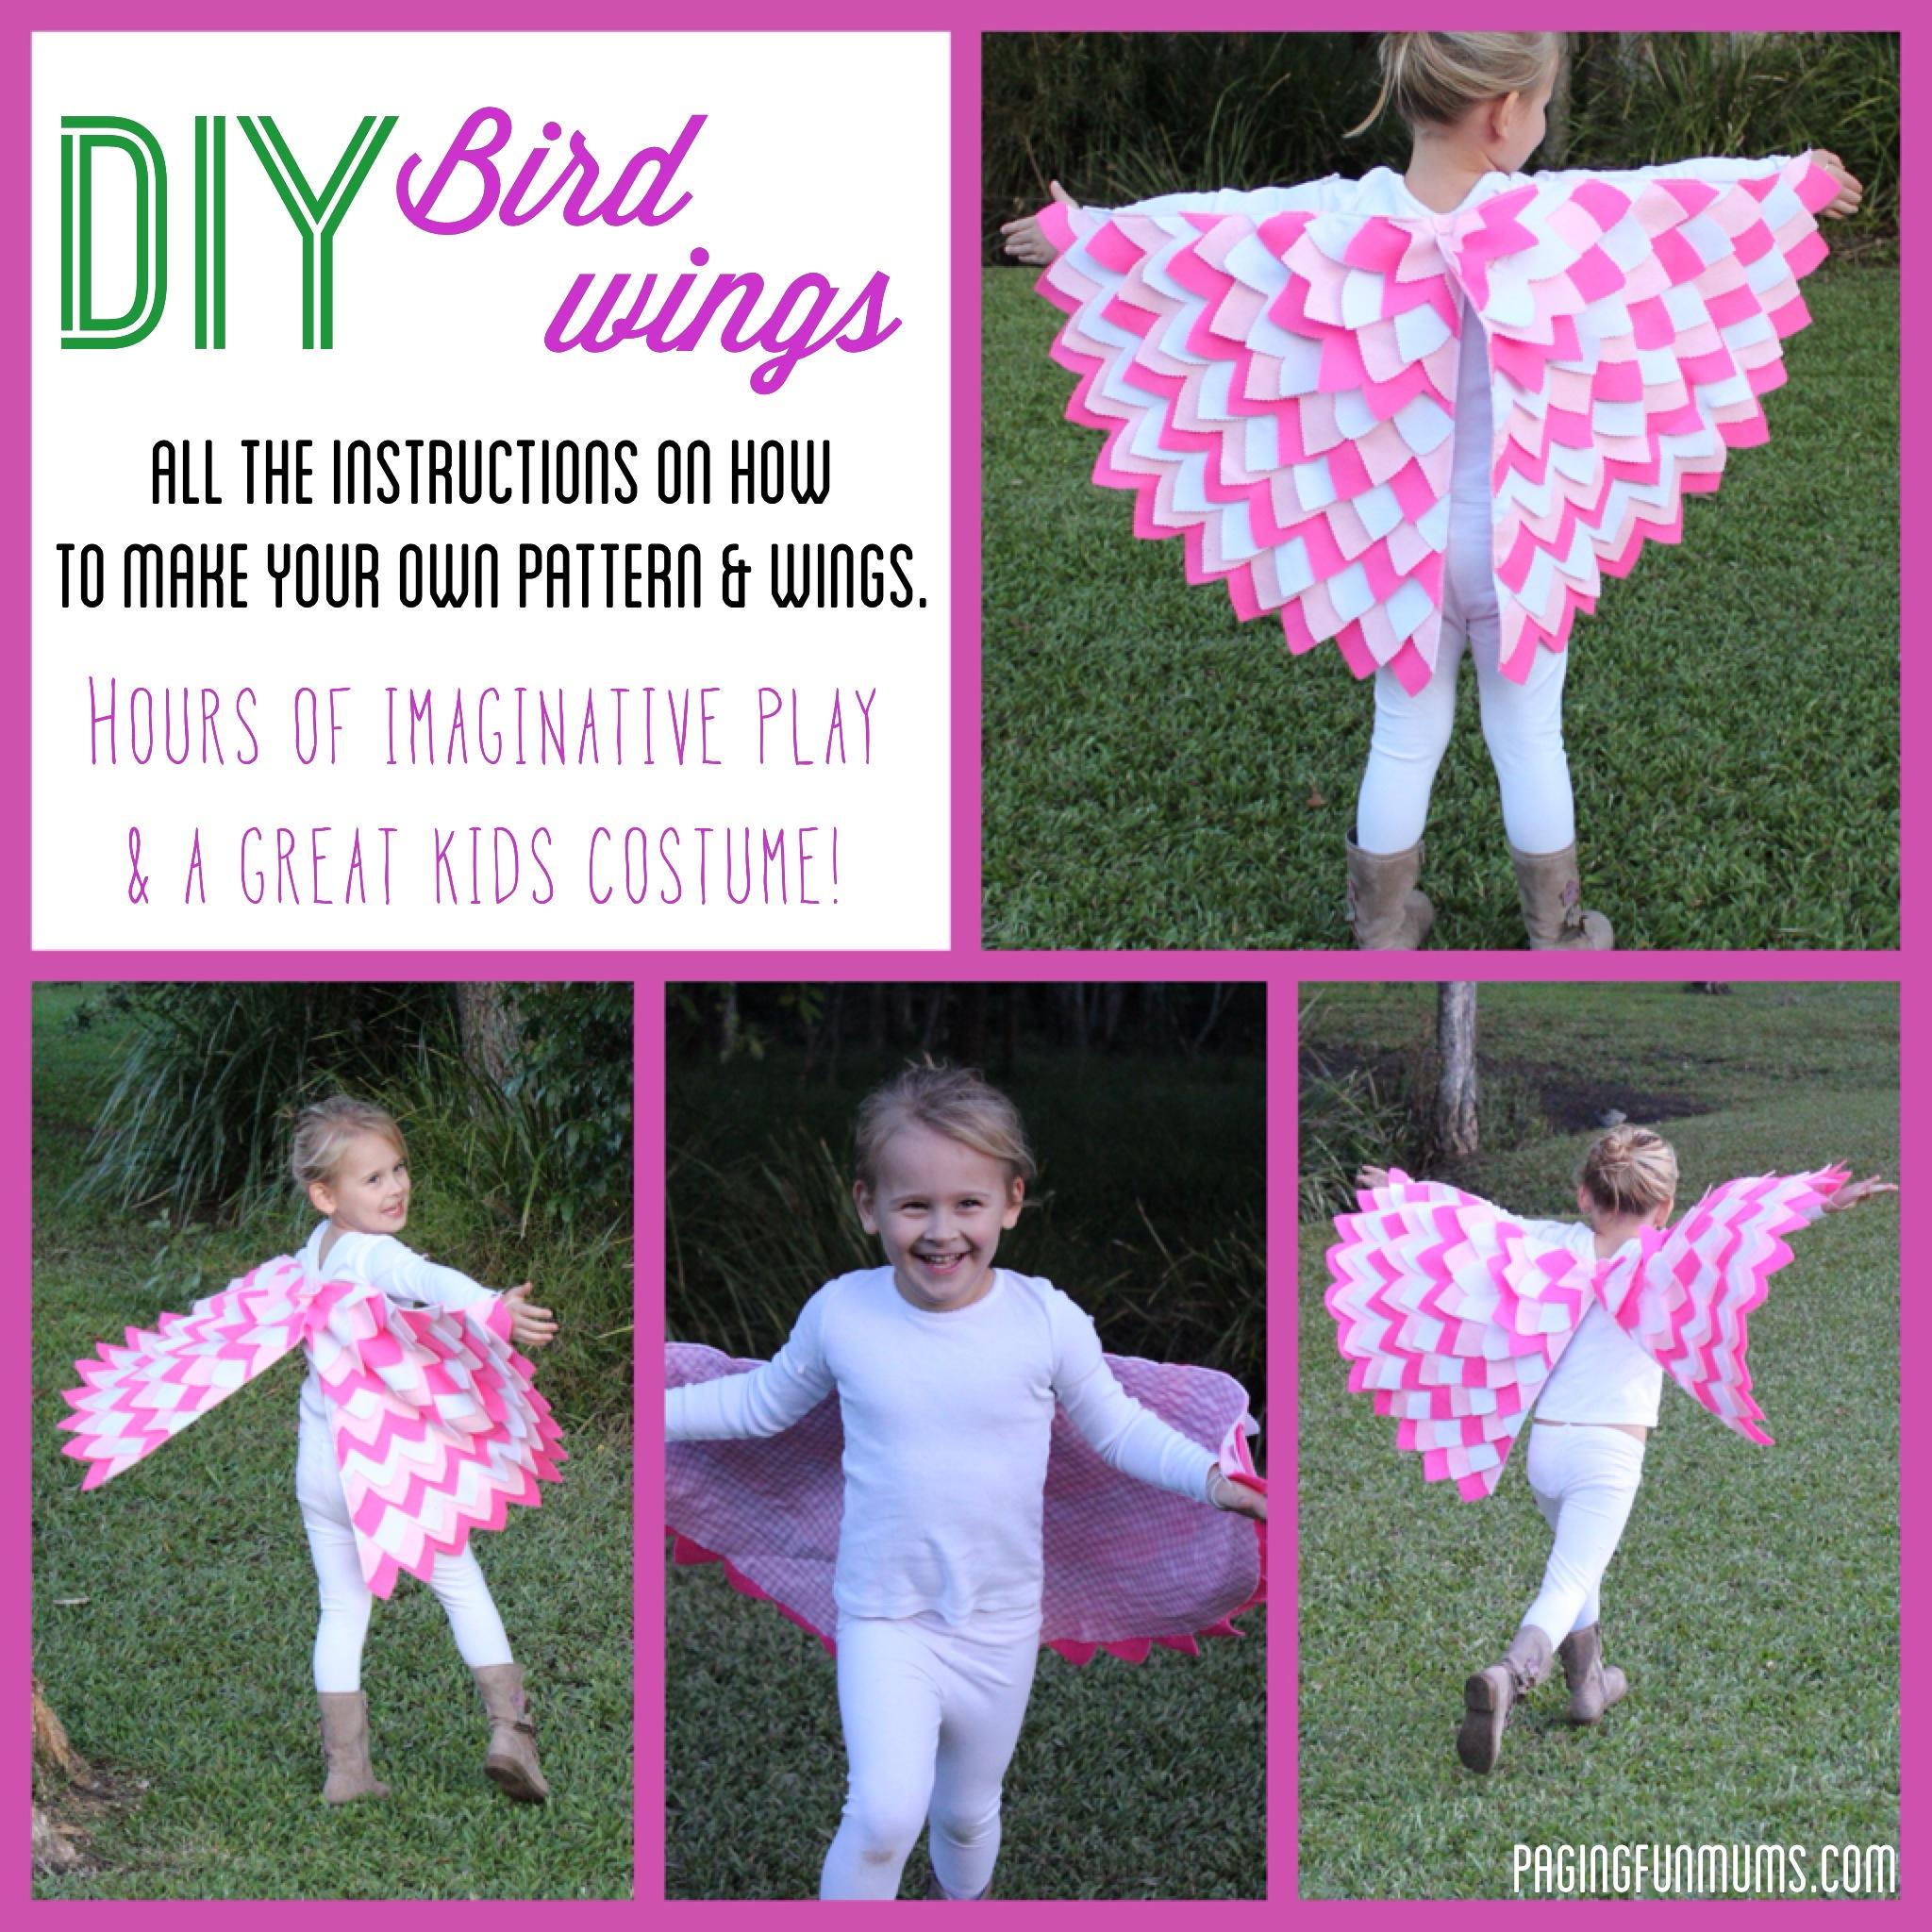 Diy bird wings solutioingenieria Gallery